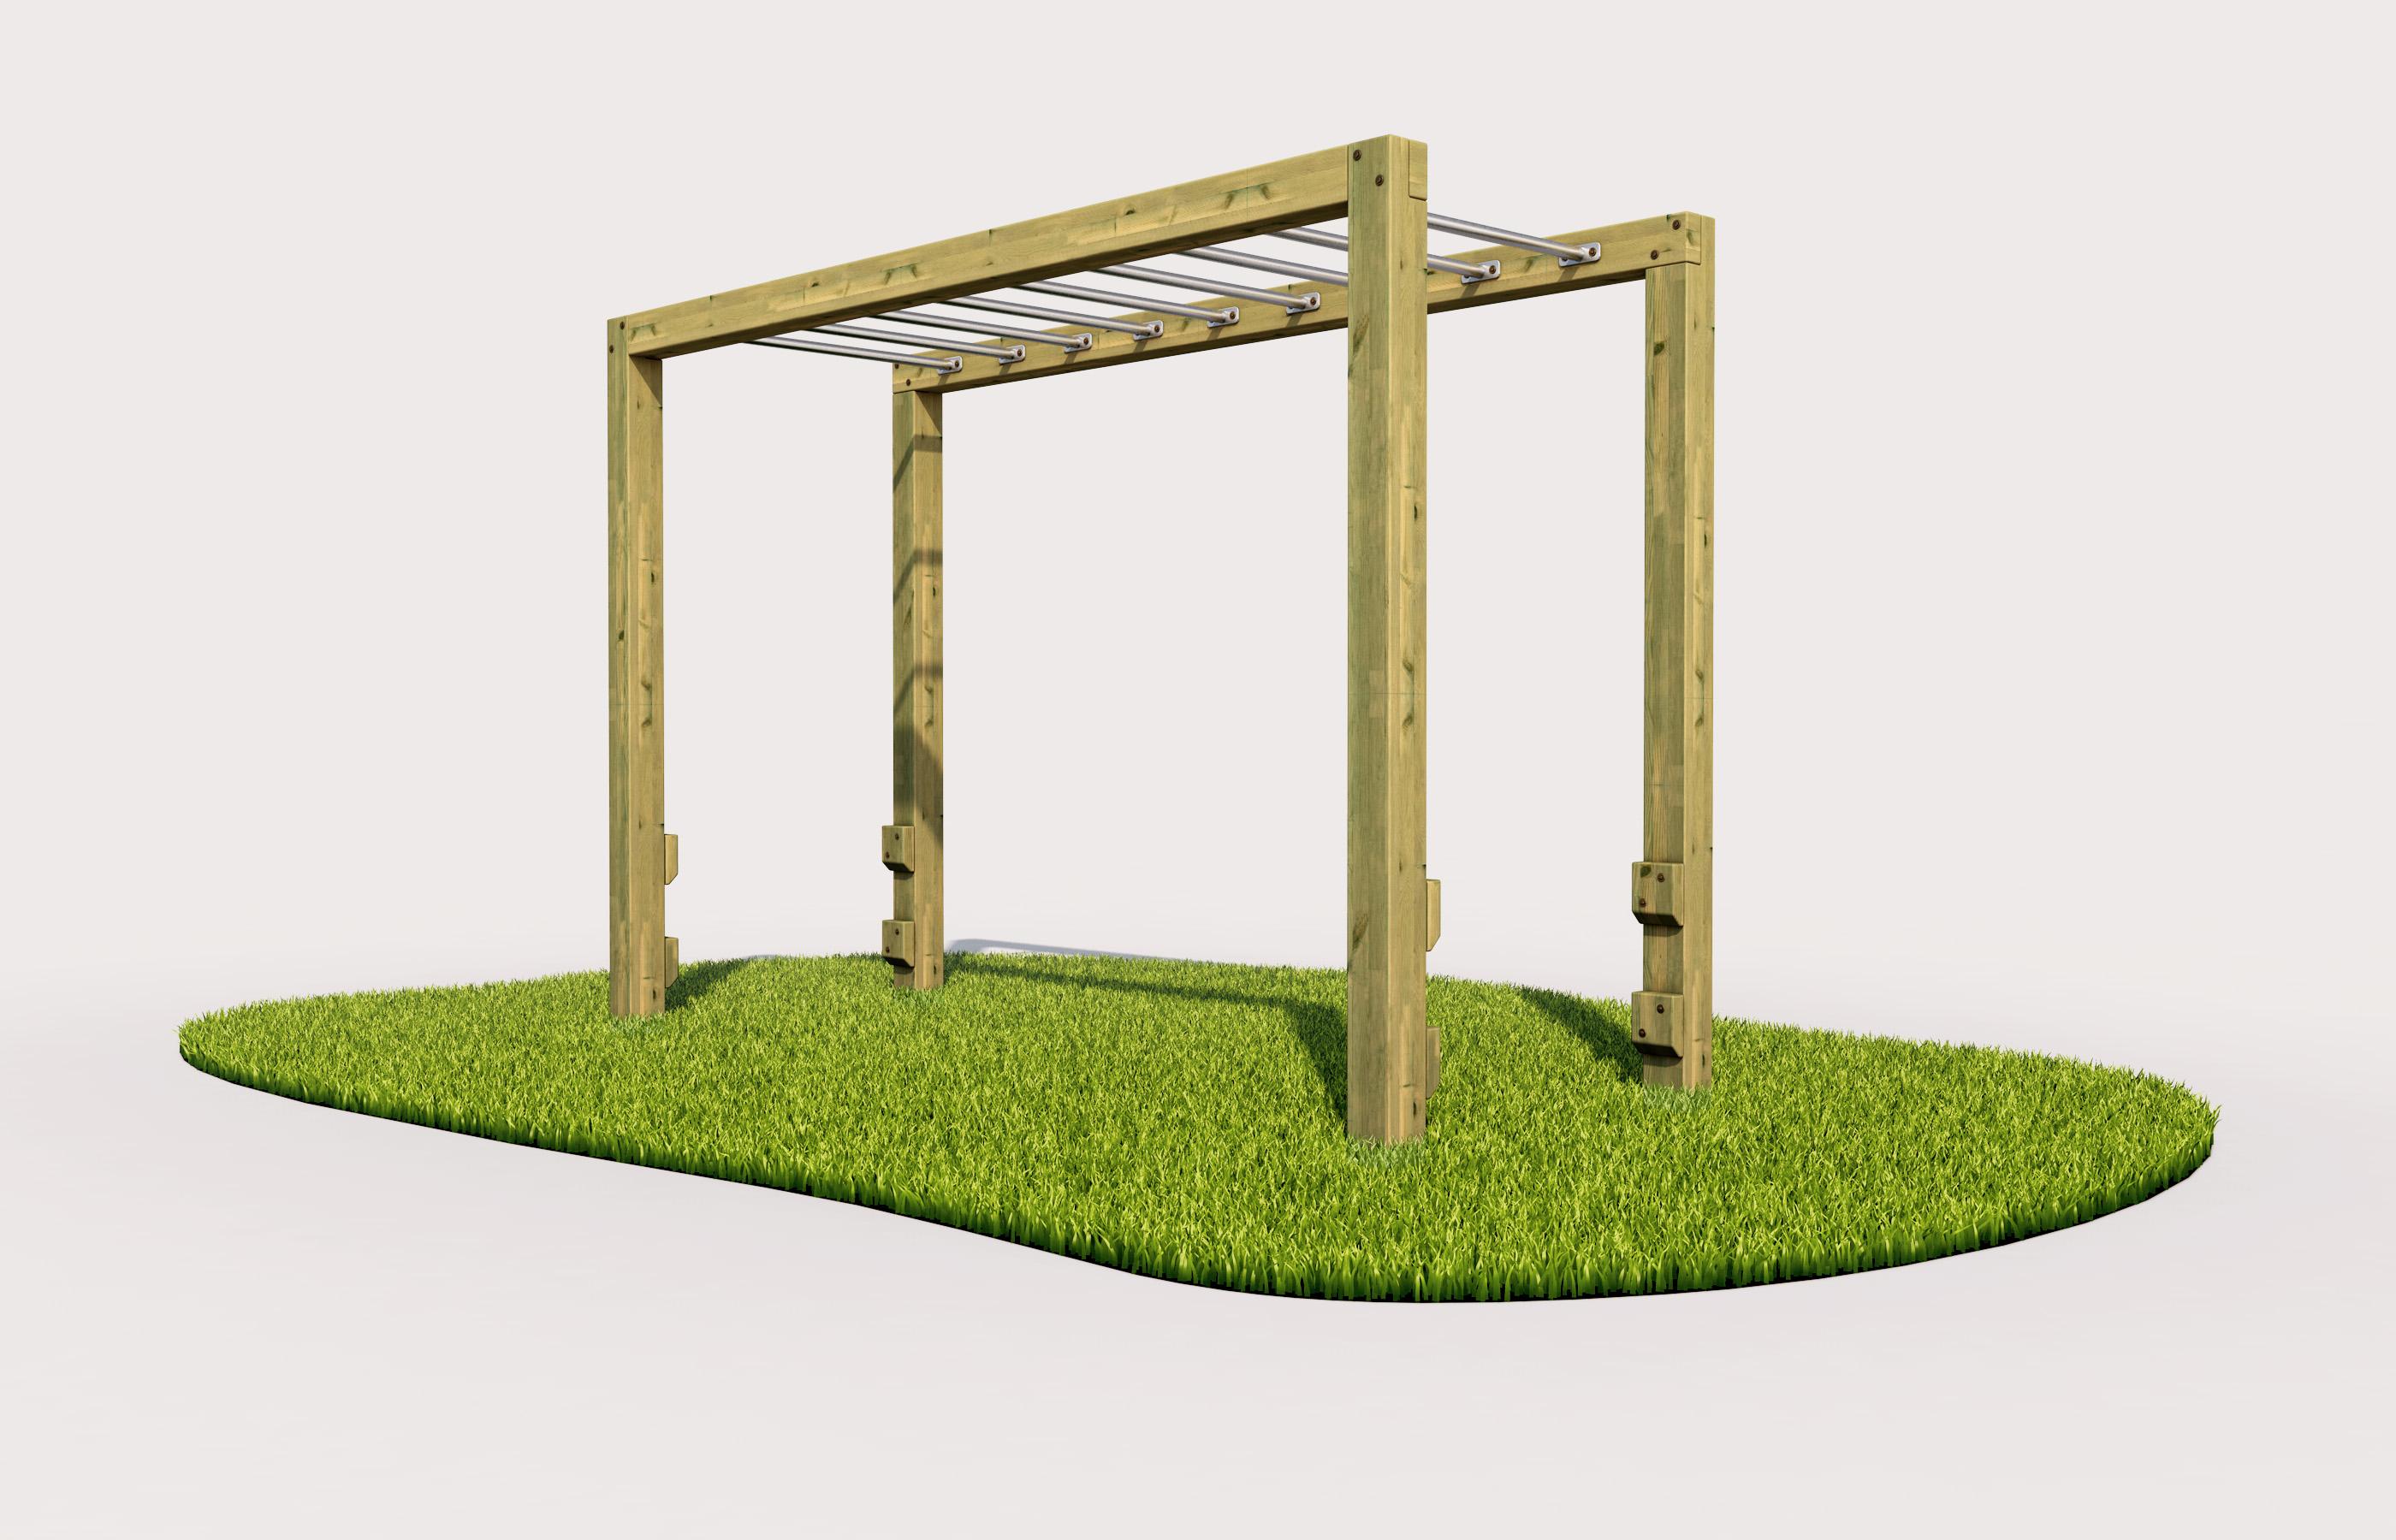 Monkey bars outdoor play